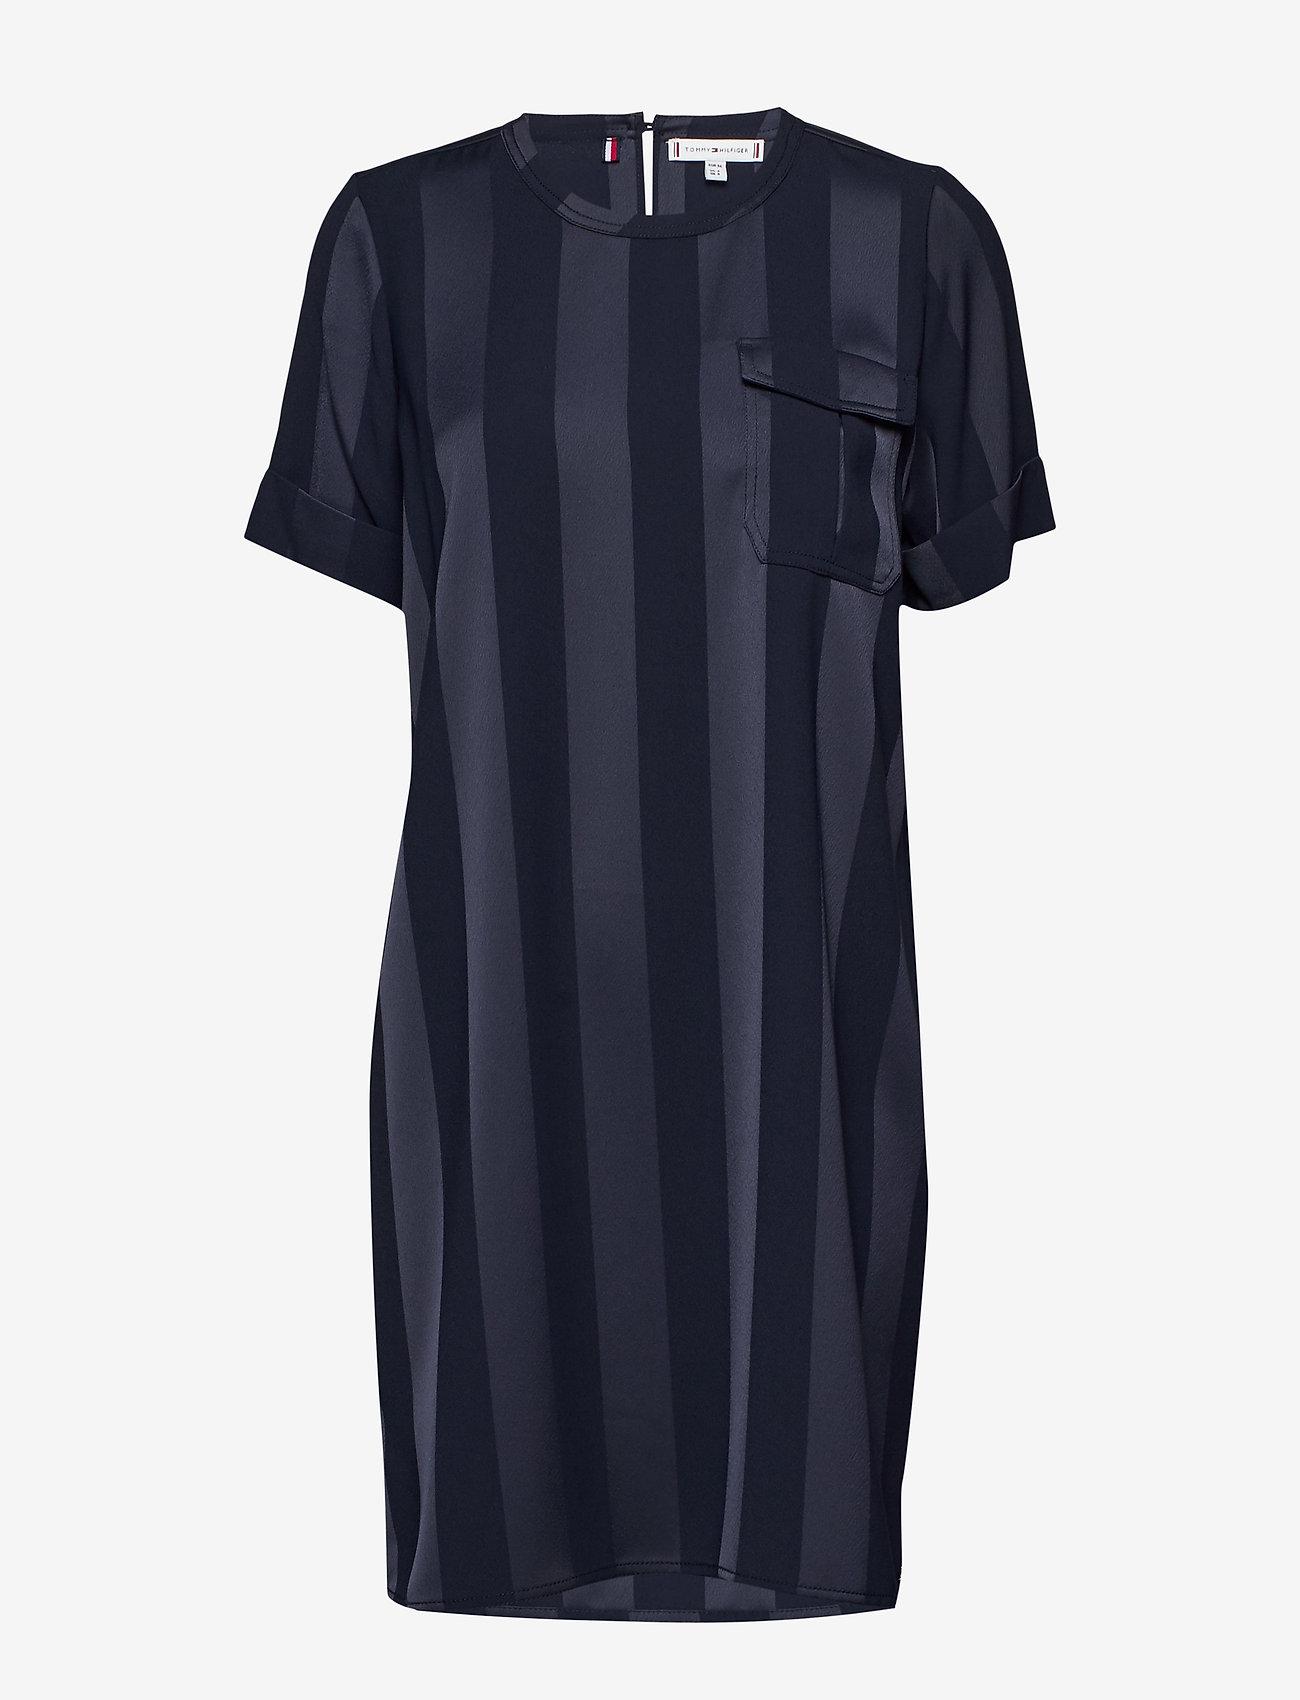 Tommy Hilfiger - FIFI DRESS SS - midi dresses - desert sky - 0